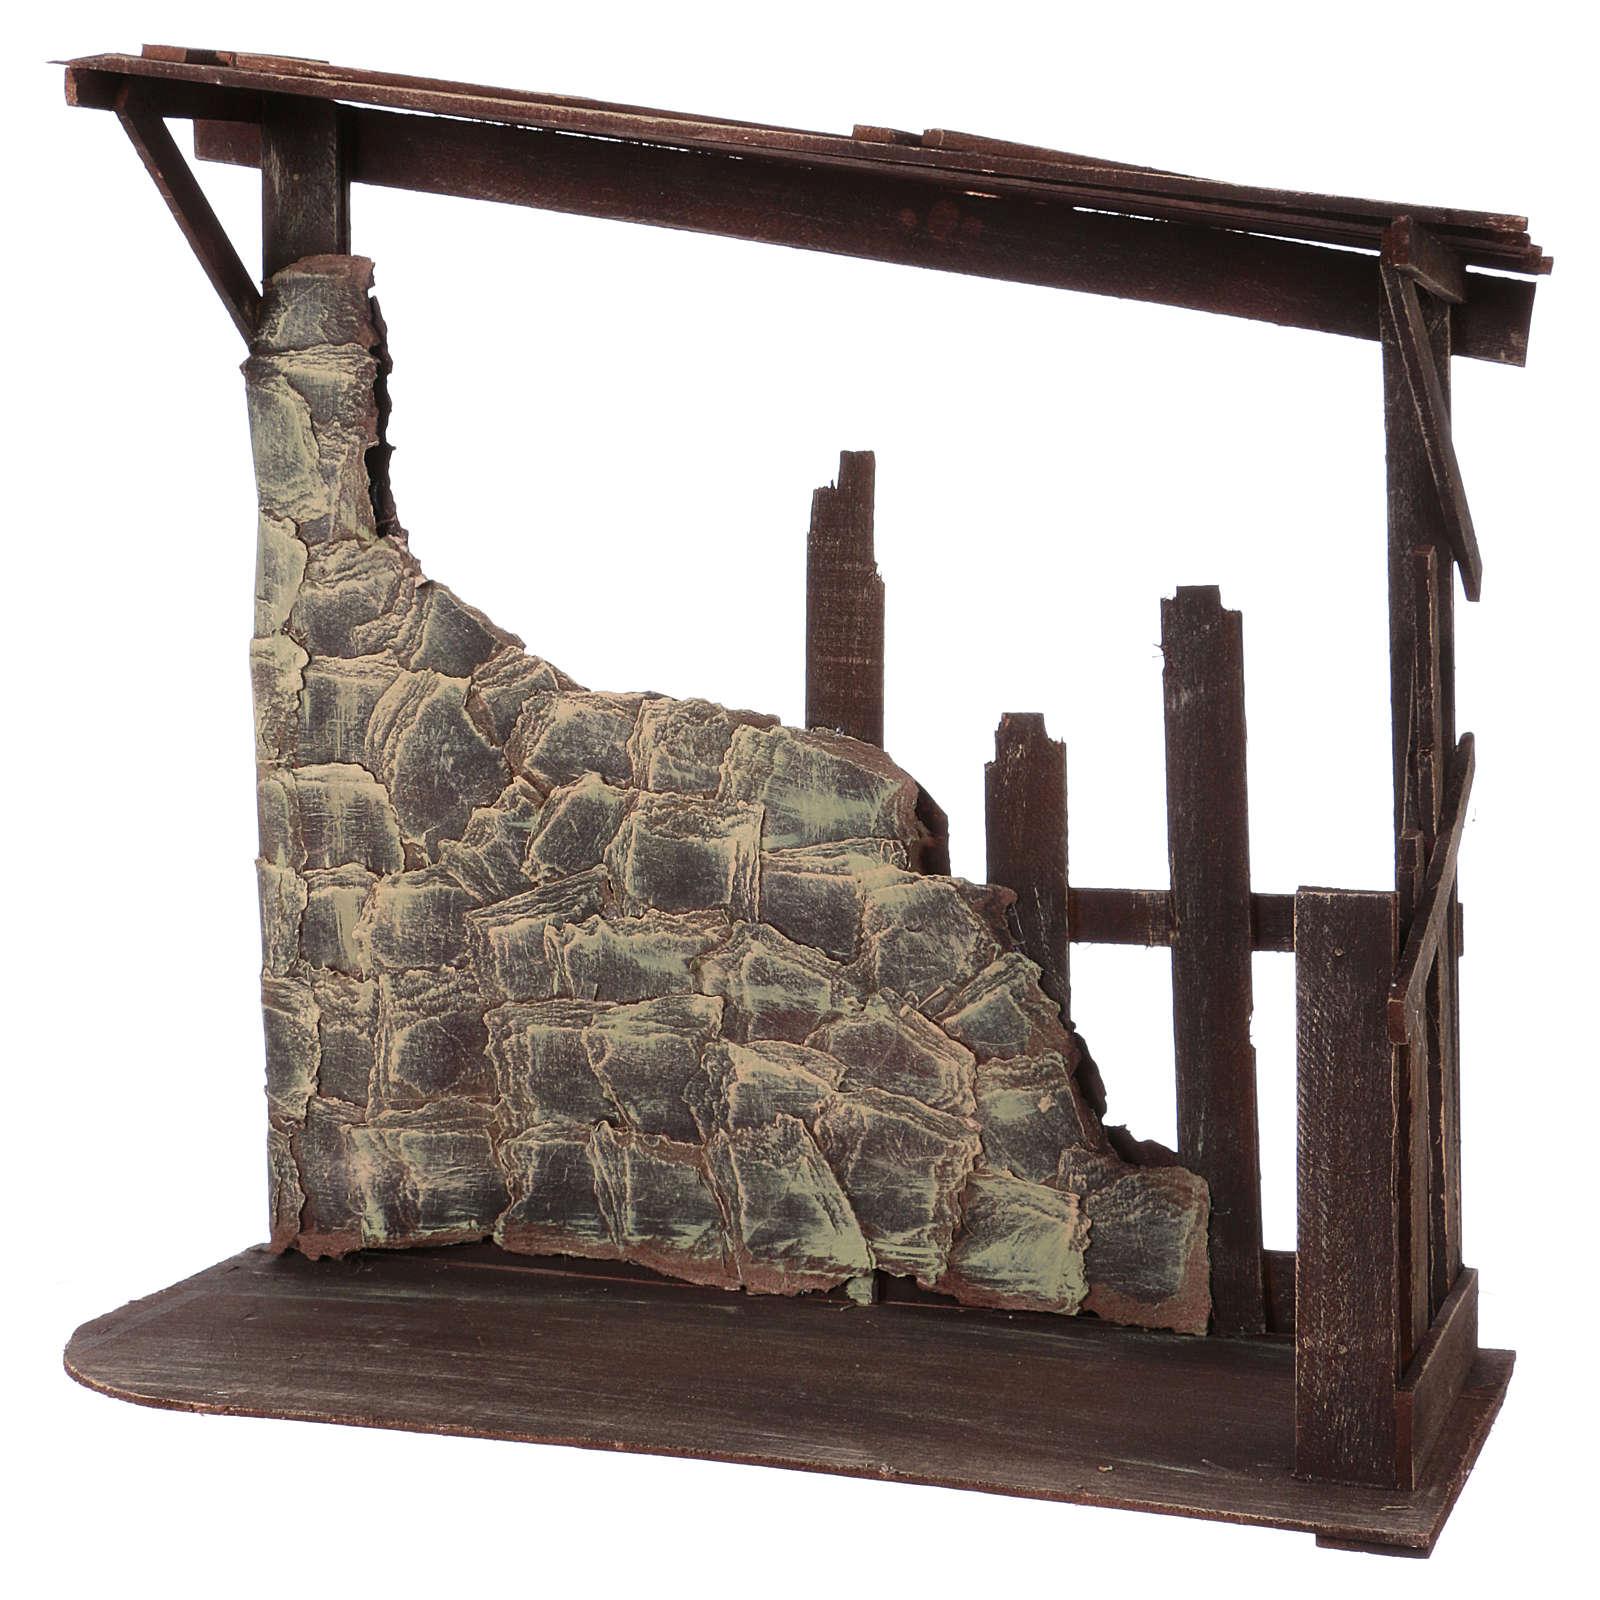 Cabaña de madera dimensiones 60x70x30 cm para belén 50 cm 4